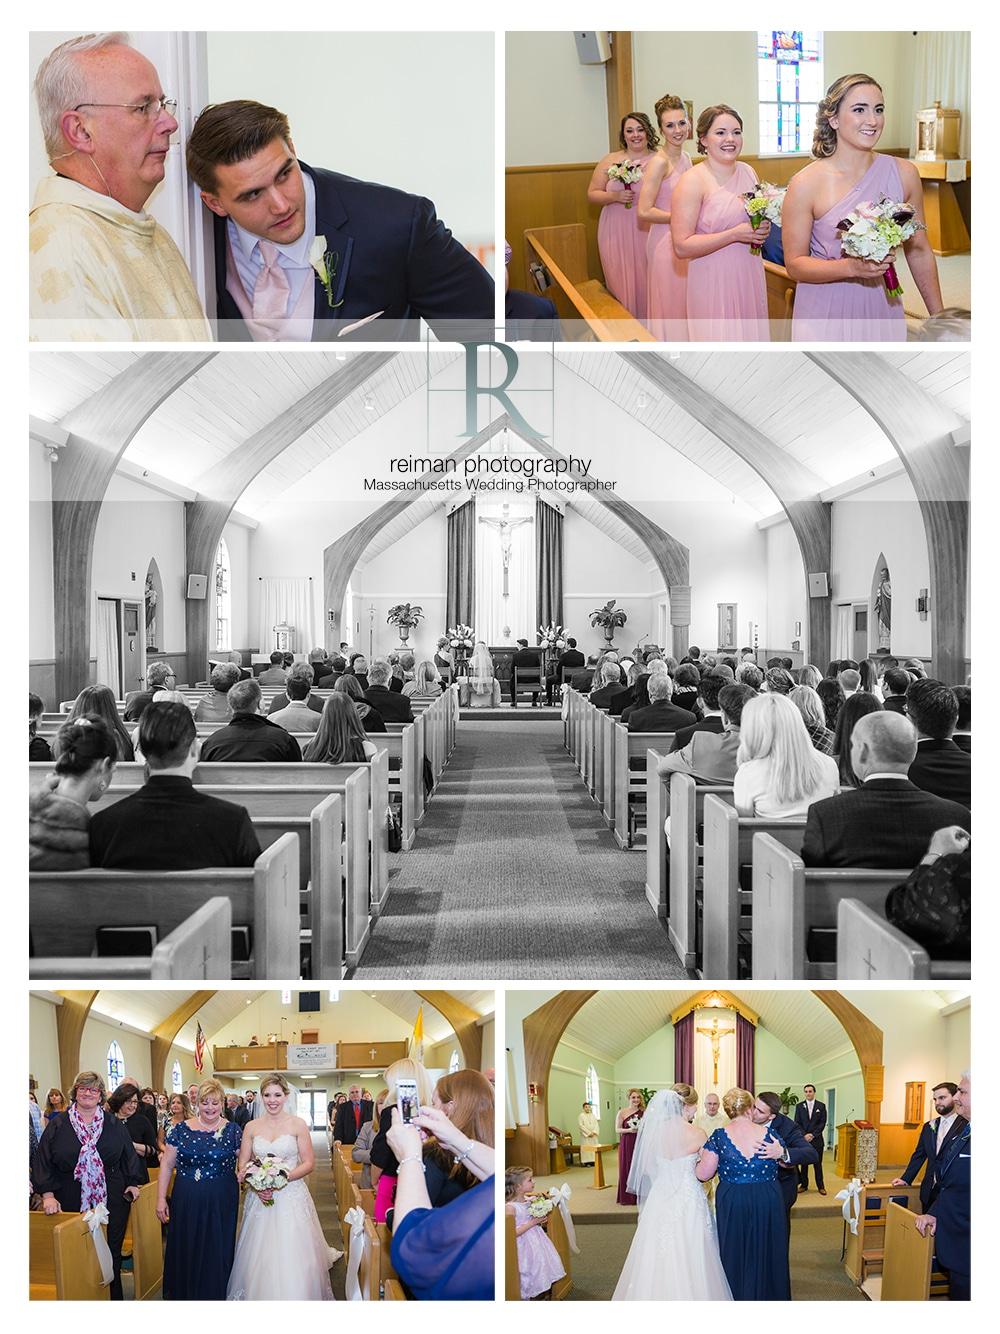 Chocksett Inn Wedding, Reiman Photography, Spring